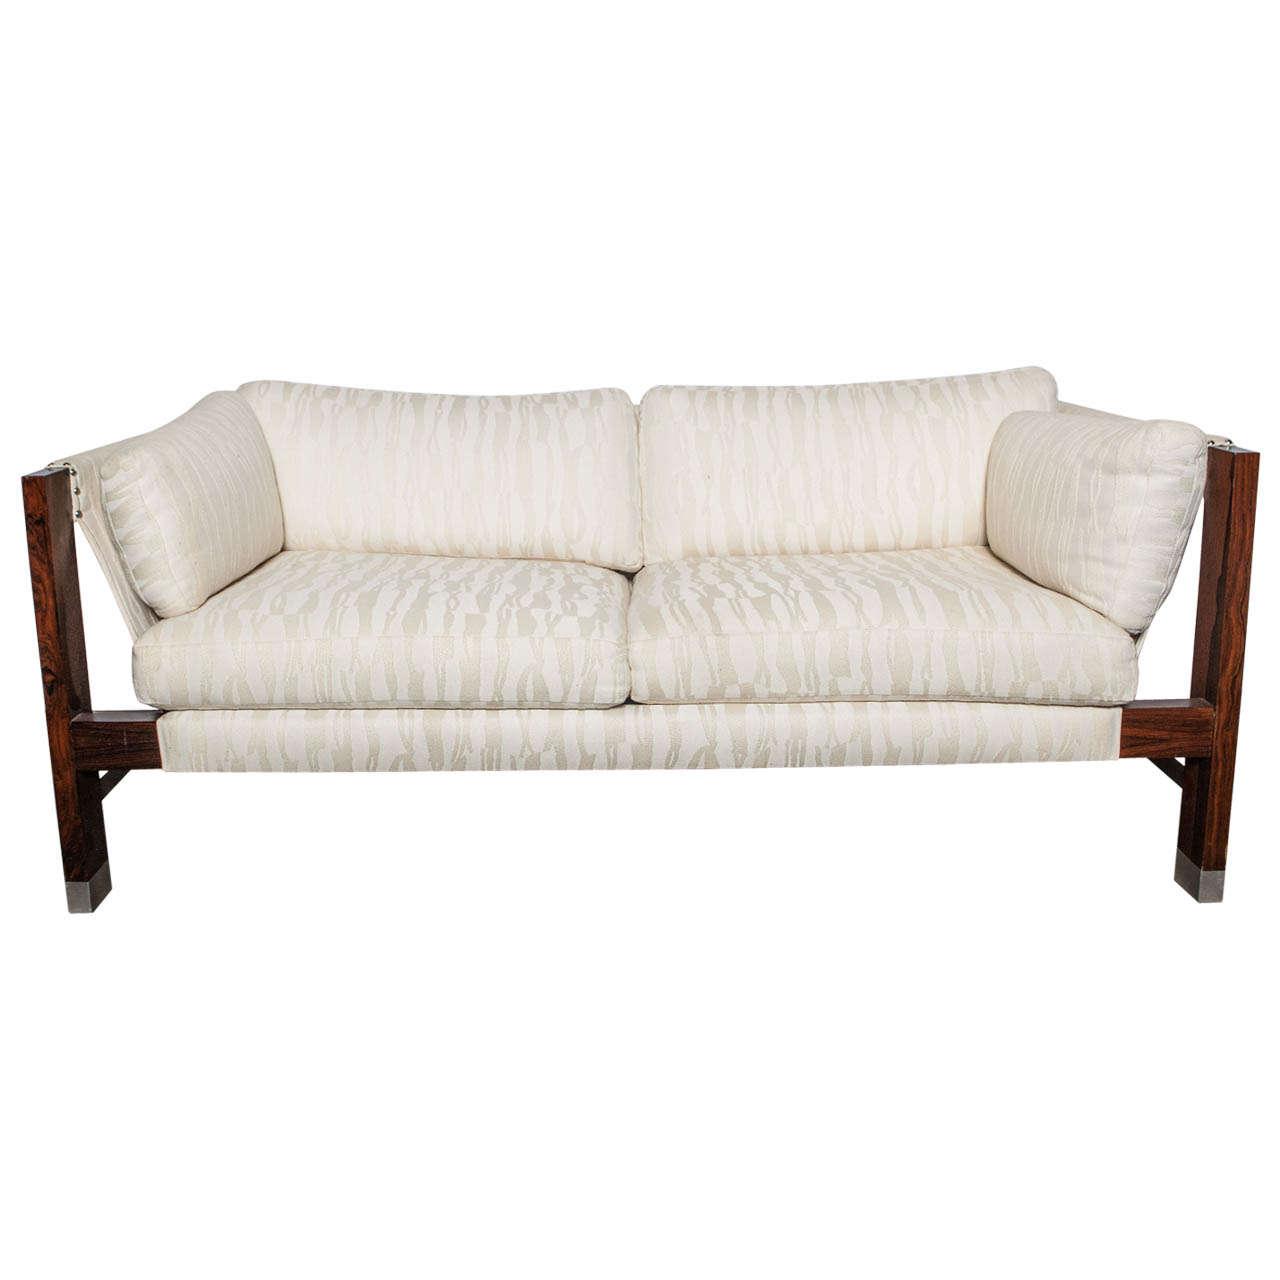 milo baughman sling sofa at 1stdibs